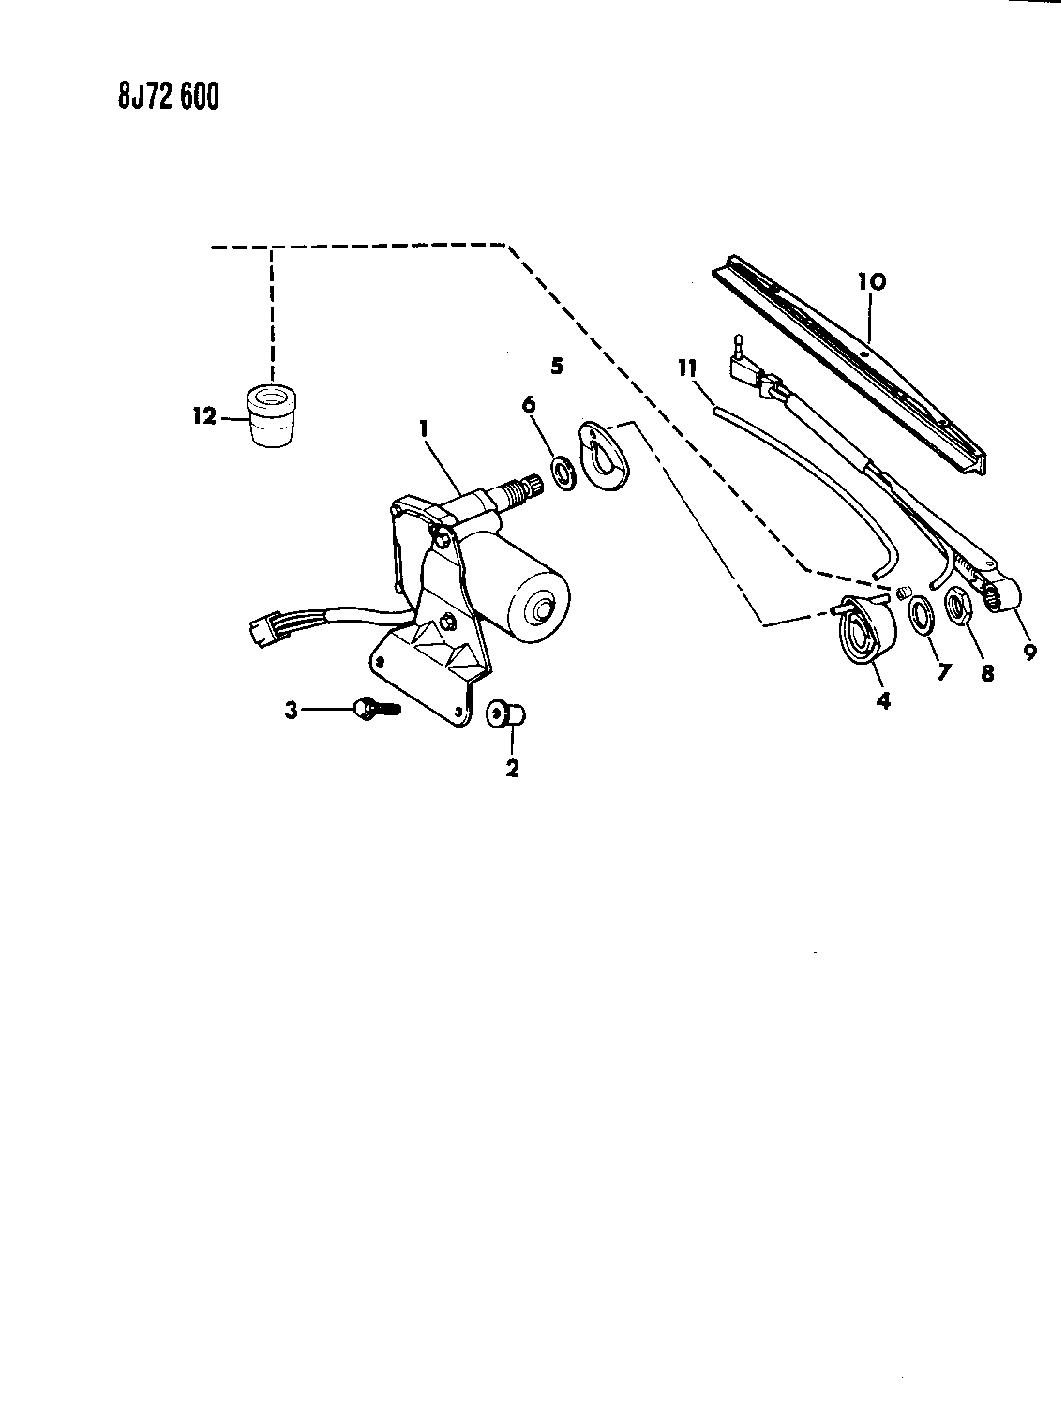 1988 jeep cherokee wiper, liftgate